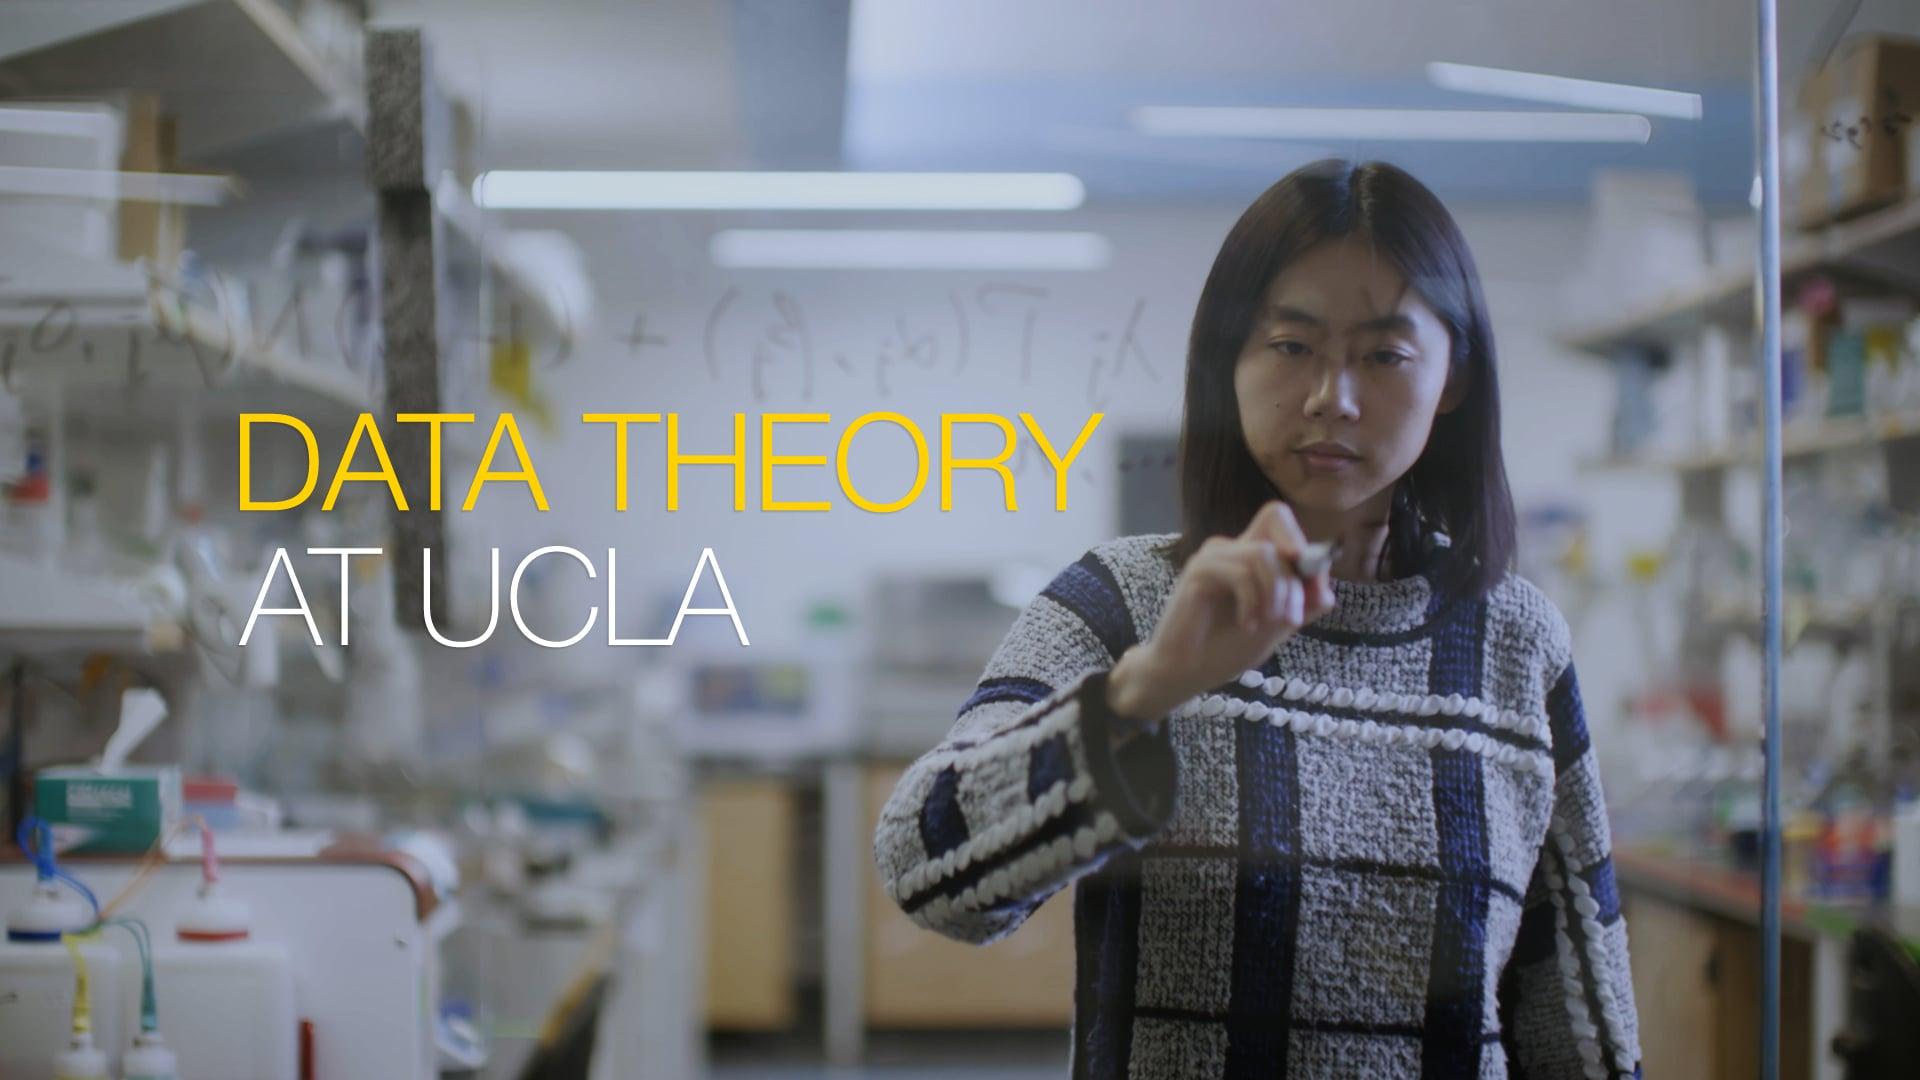 DATA THEORY AT UCLA